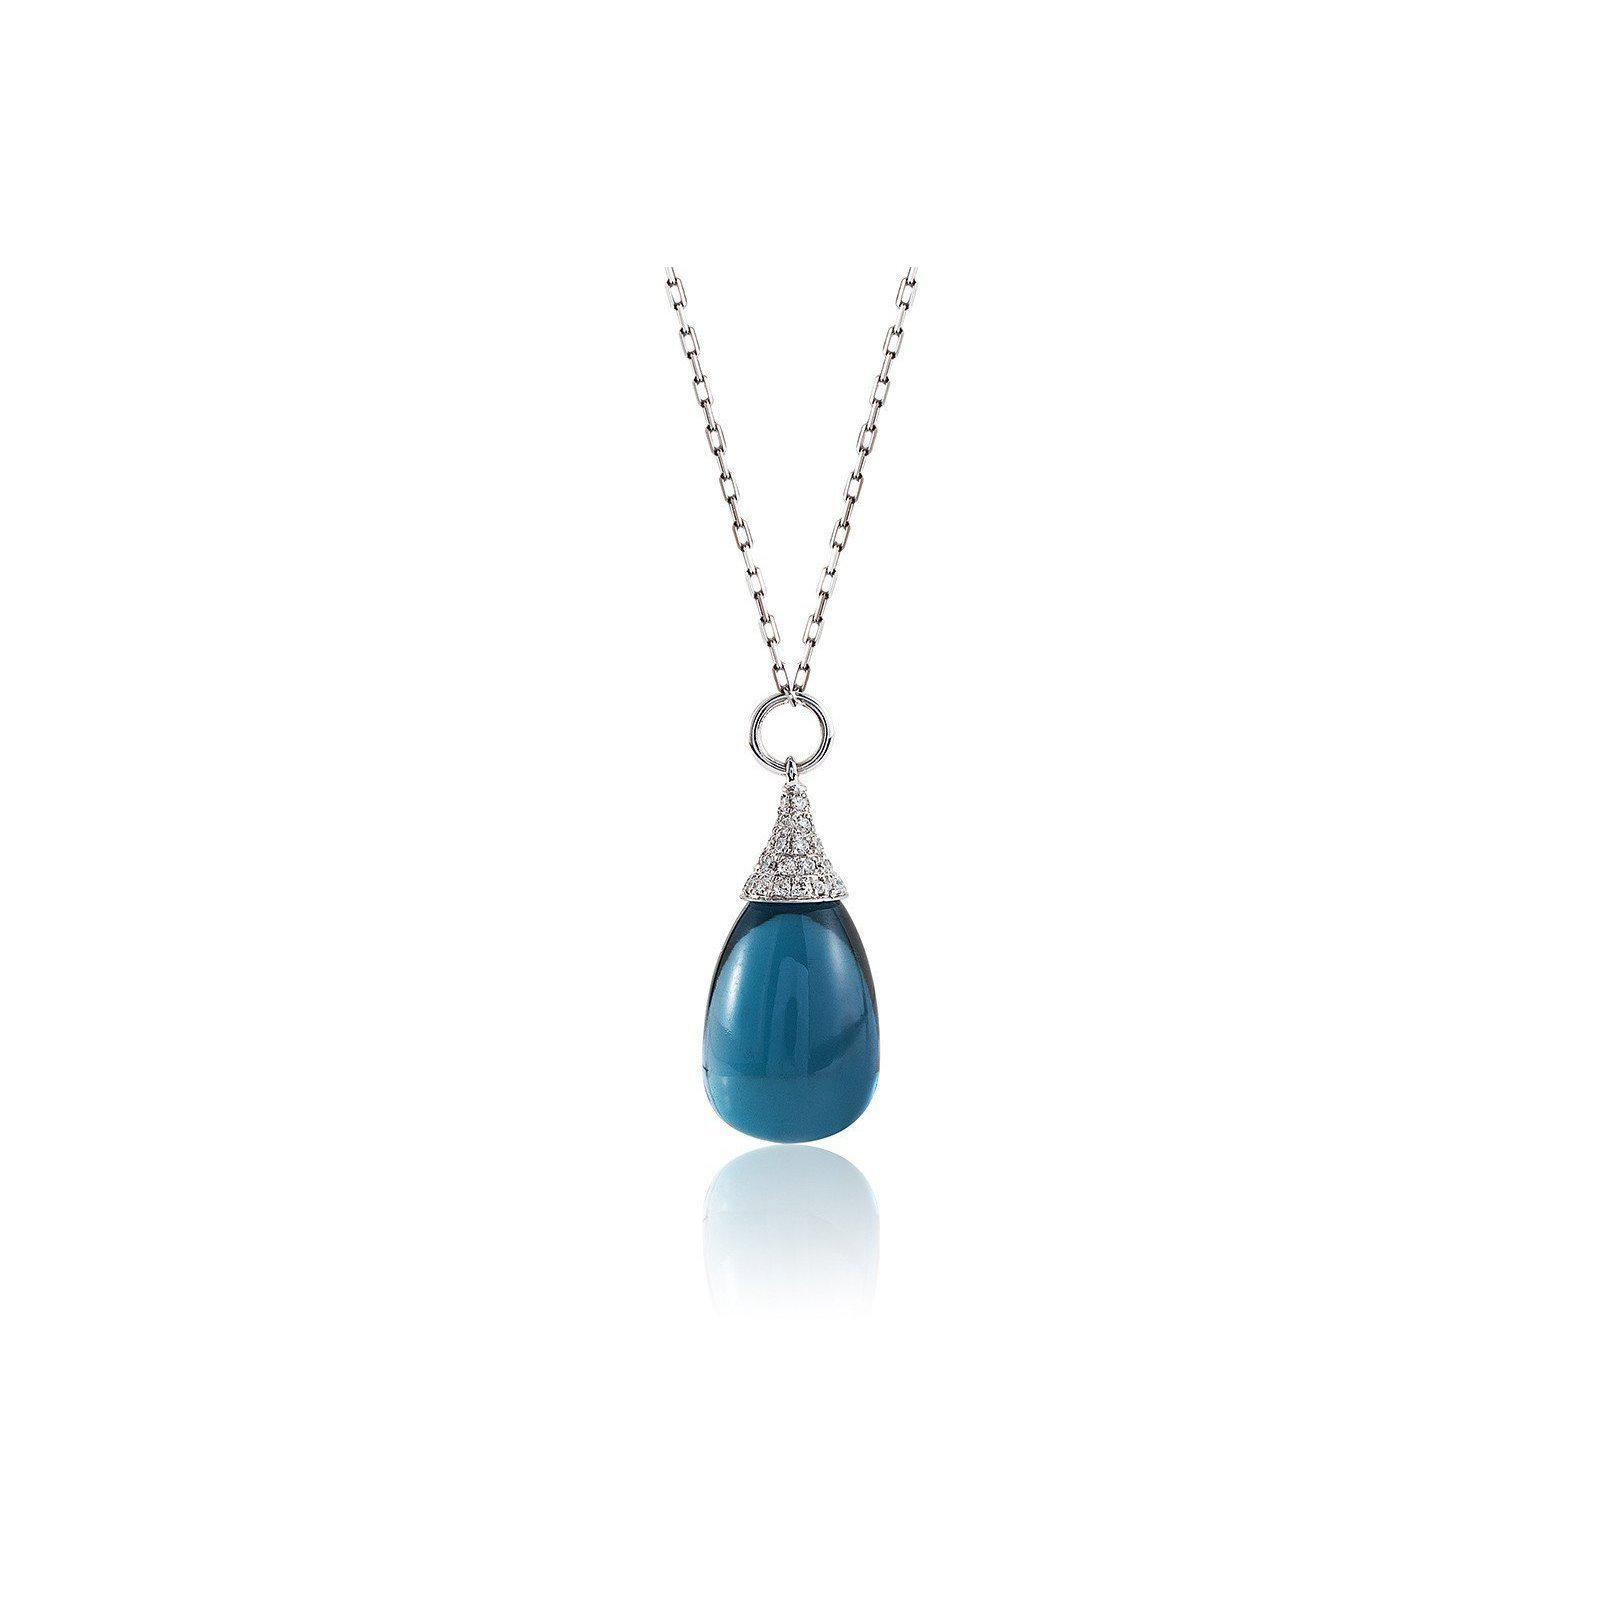 Goshwara Naughty London Blue Topaz Drop Diamond Pendant UC0wQPgWkD